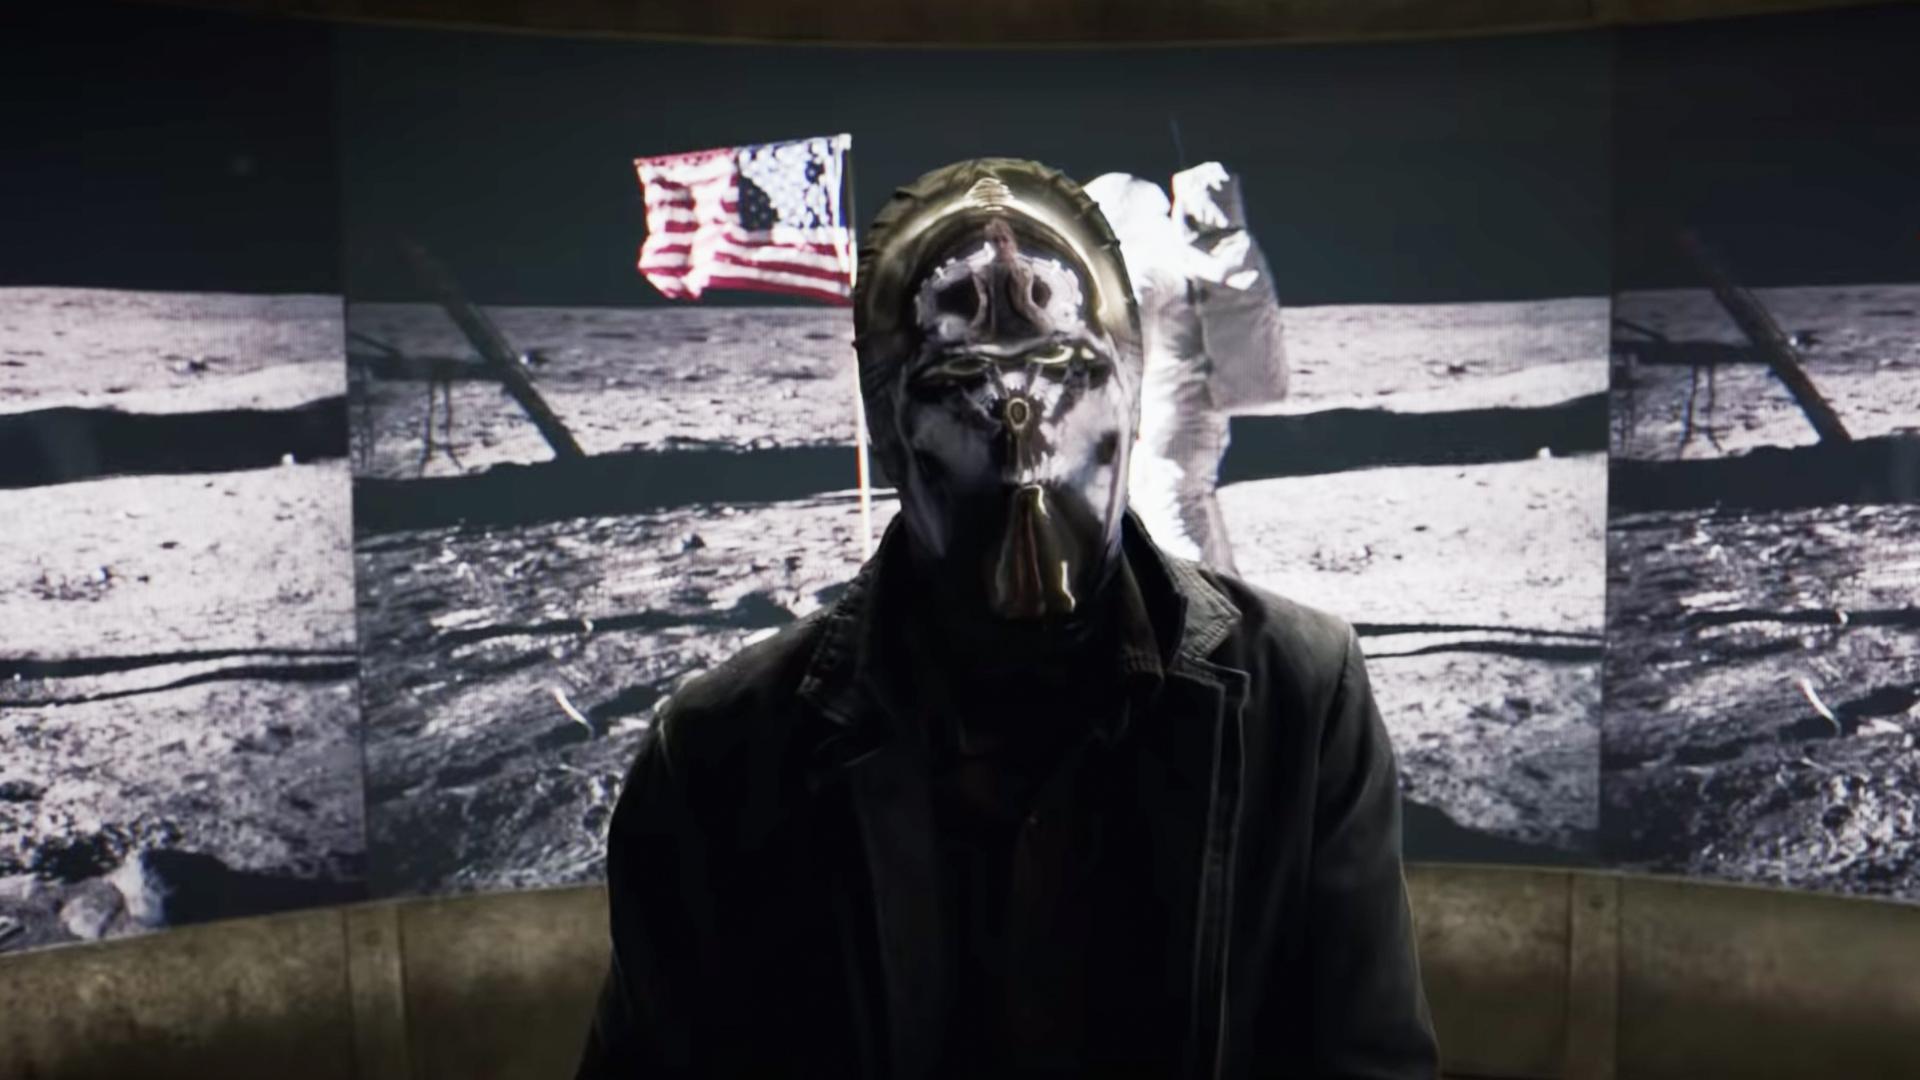 Watchmen Hbo Wallpapers Top Free Watchmen Hbo Backgrounds Wallpaperaccess